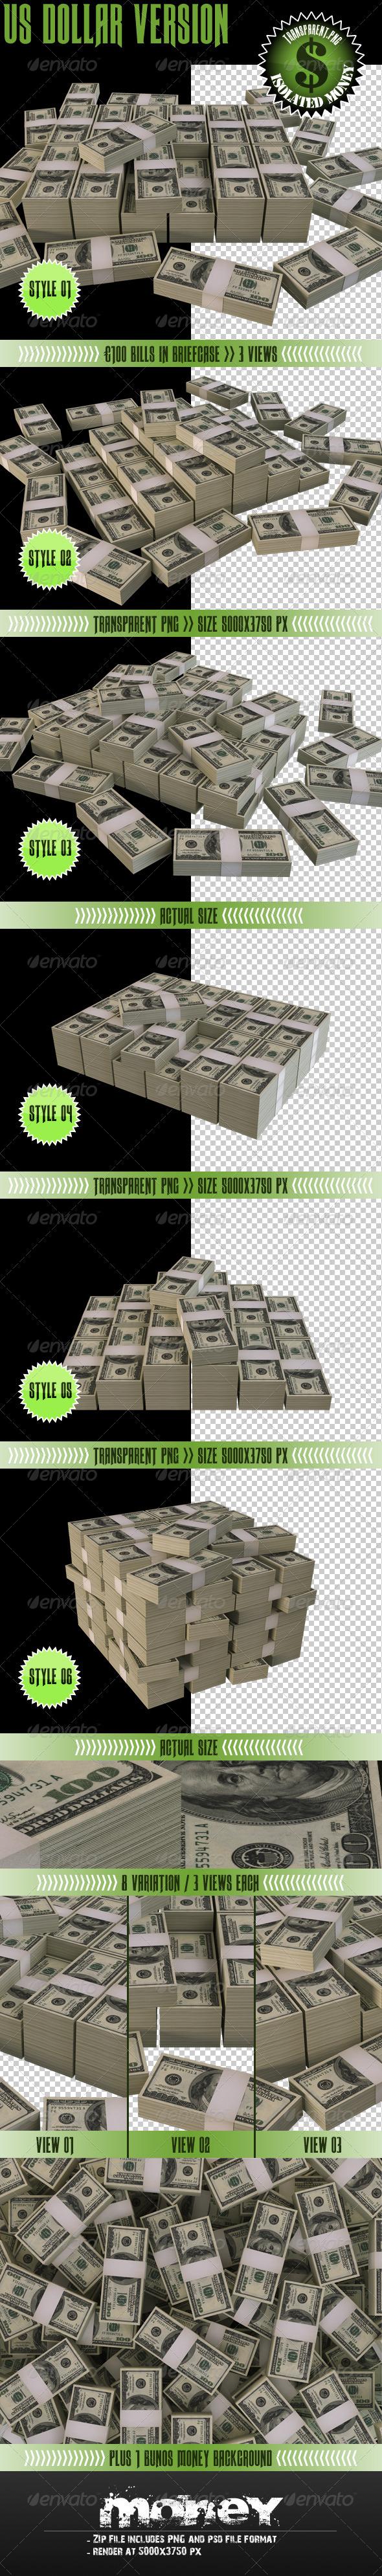 GraphicRiver Money 6979210